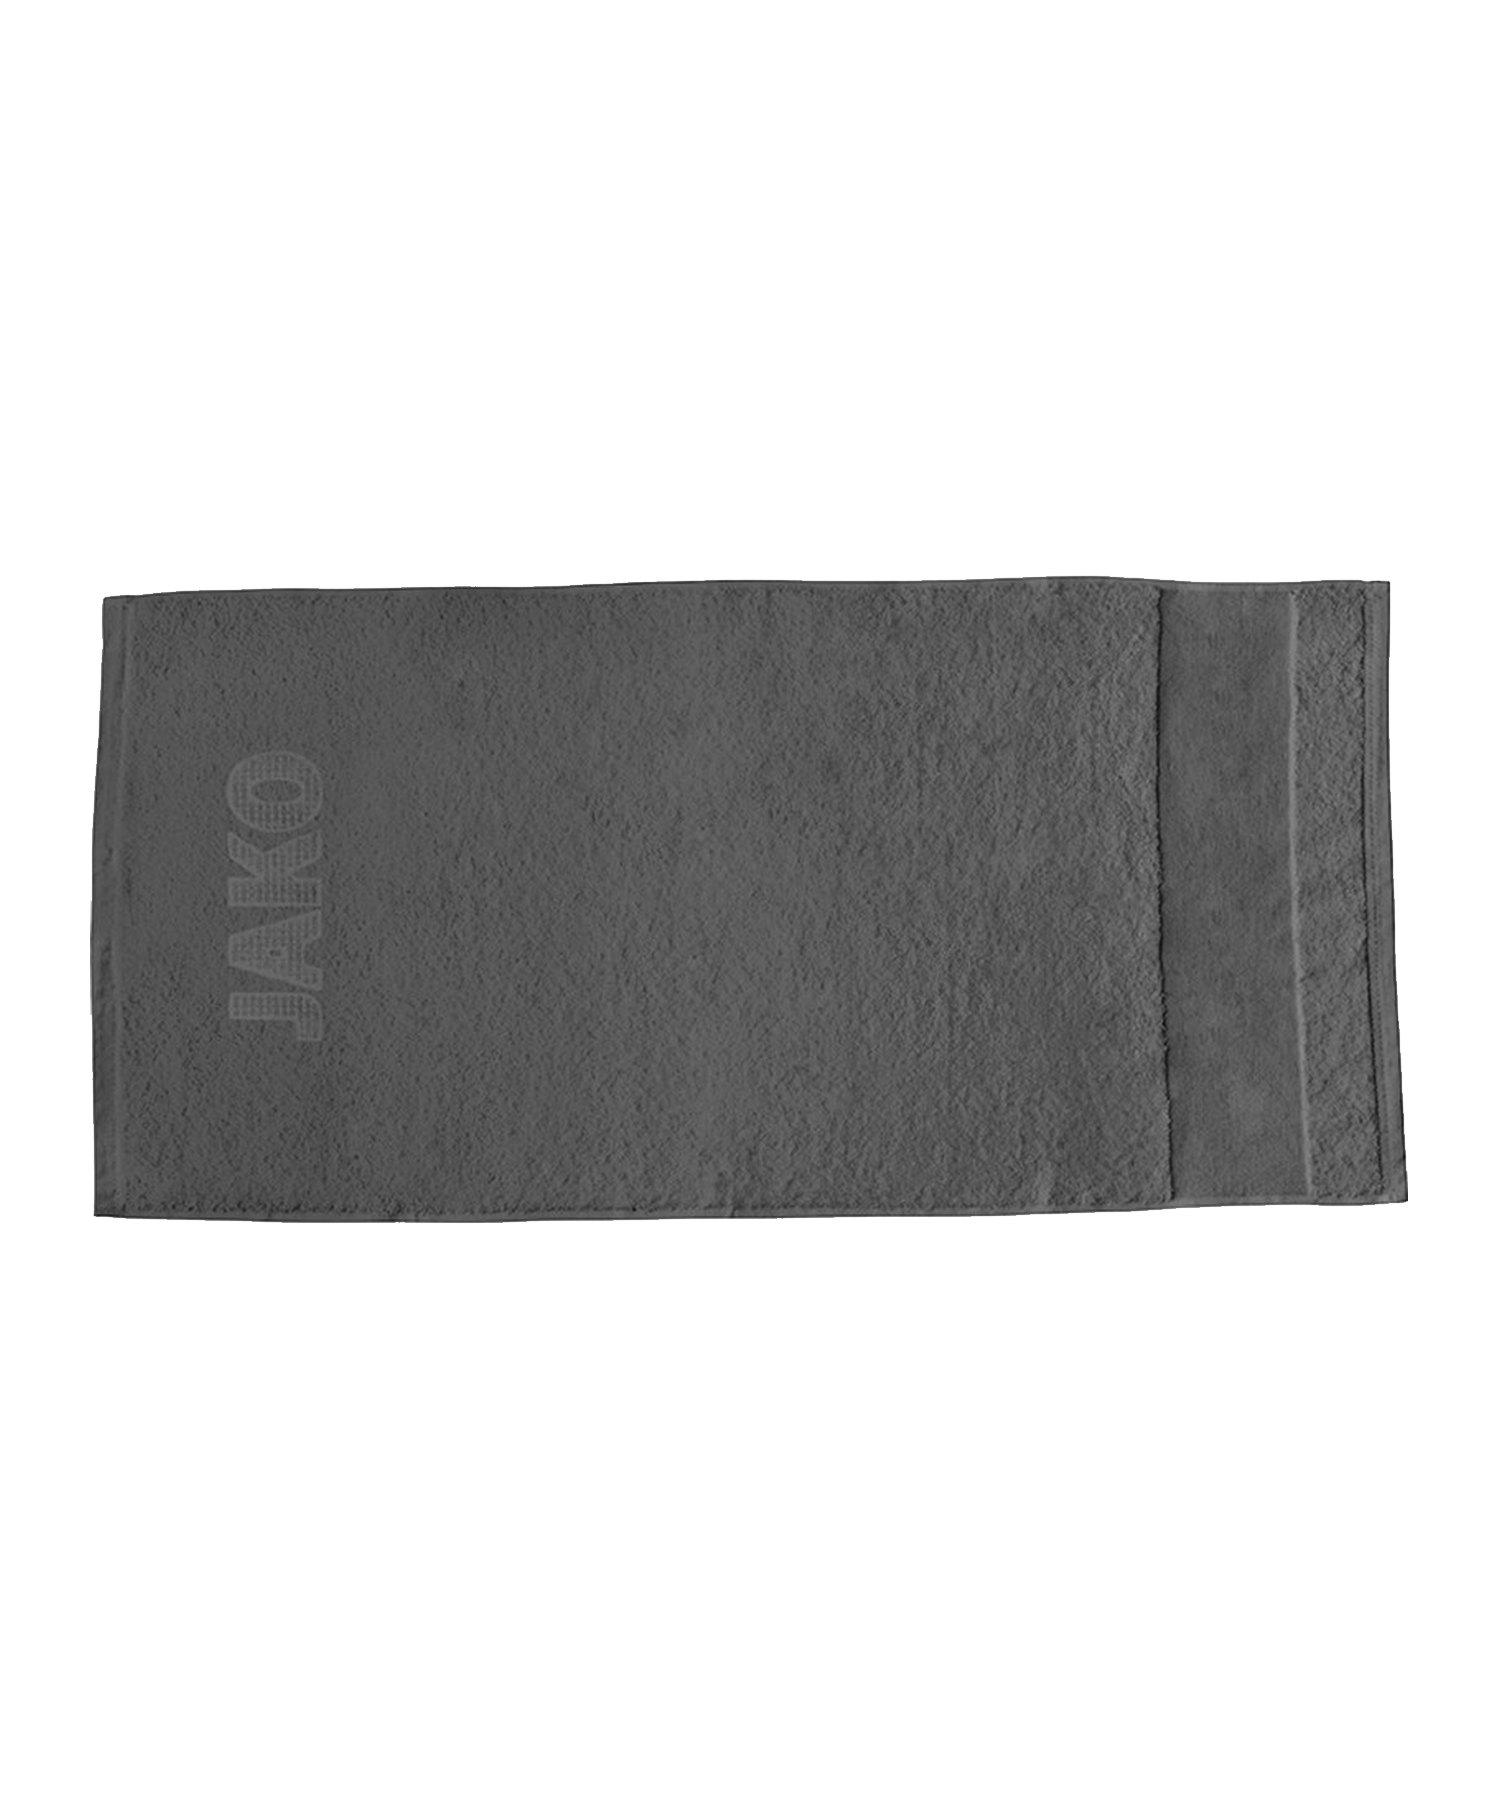 Jako Handtuch 50x100cm Grau F21 - grau